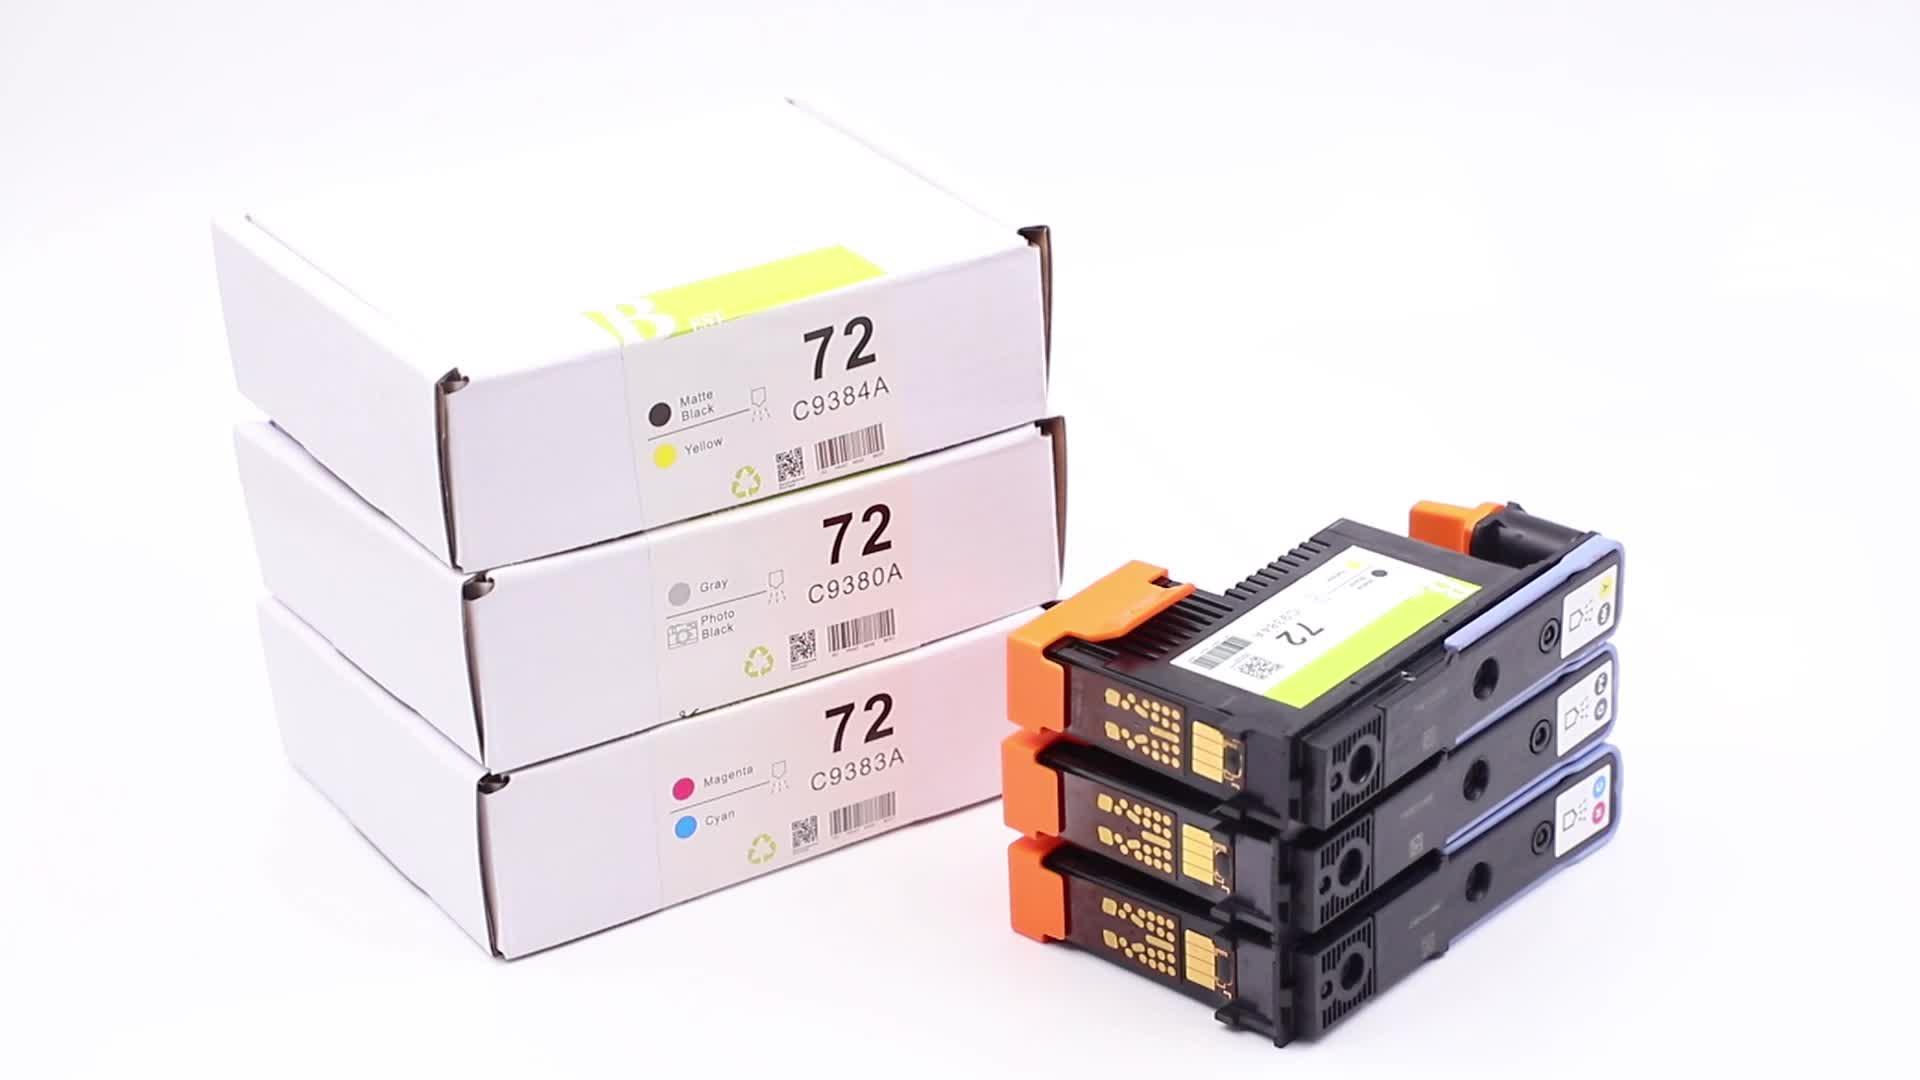 OCBESTJET For HP 72 For HP Designjet T2300 Printhead For HP T770 T790 T1120 T1200 T1300 T620 T610 T1100 T2300 Printer